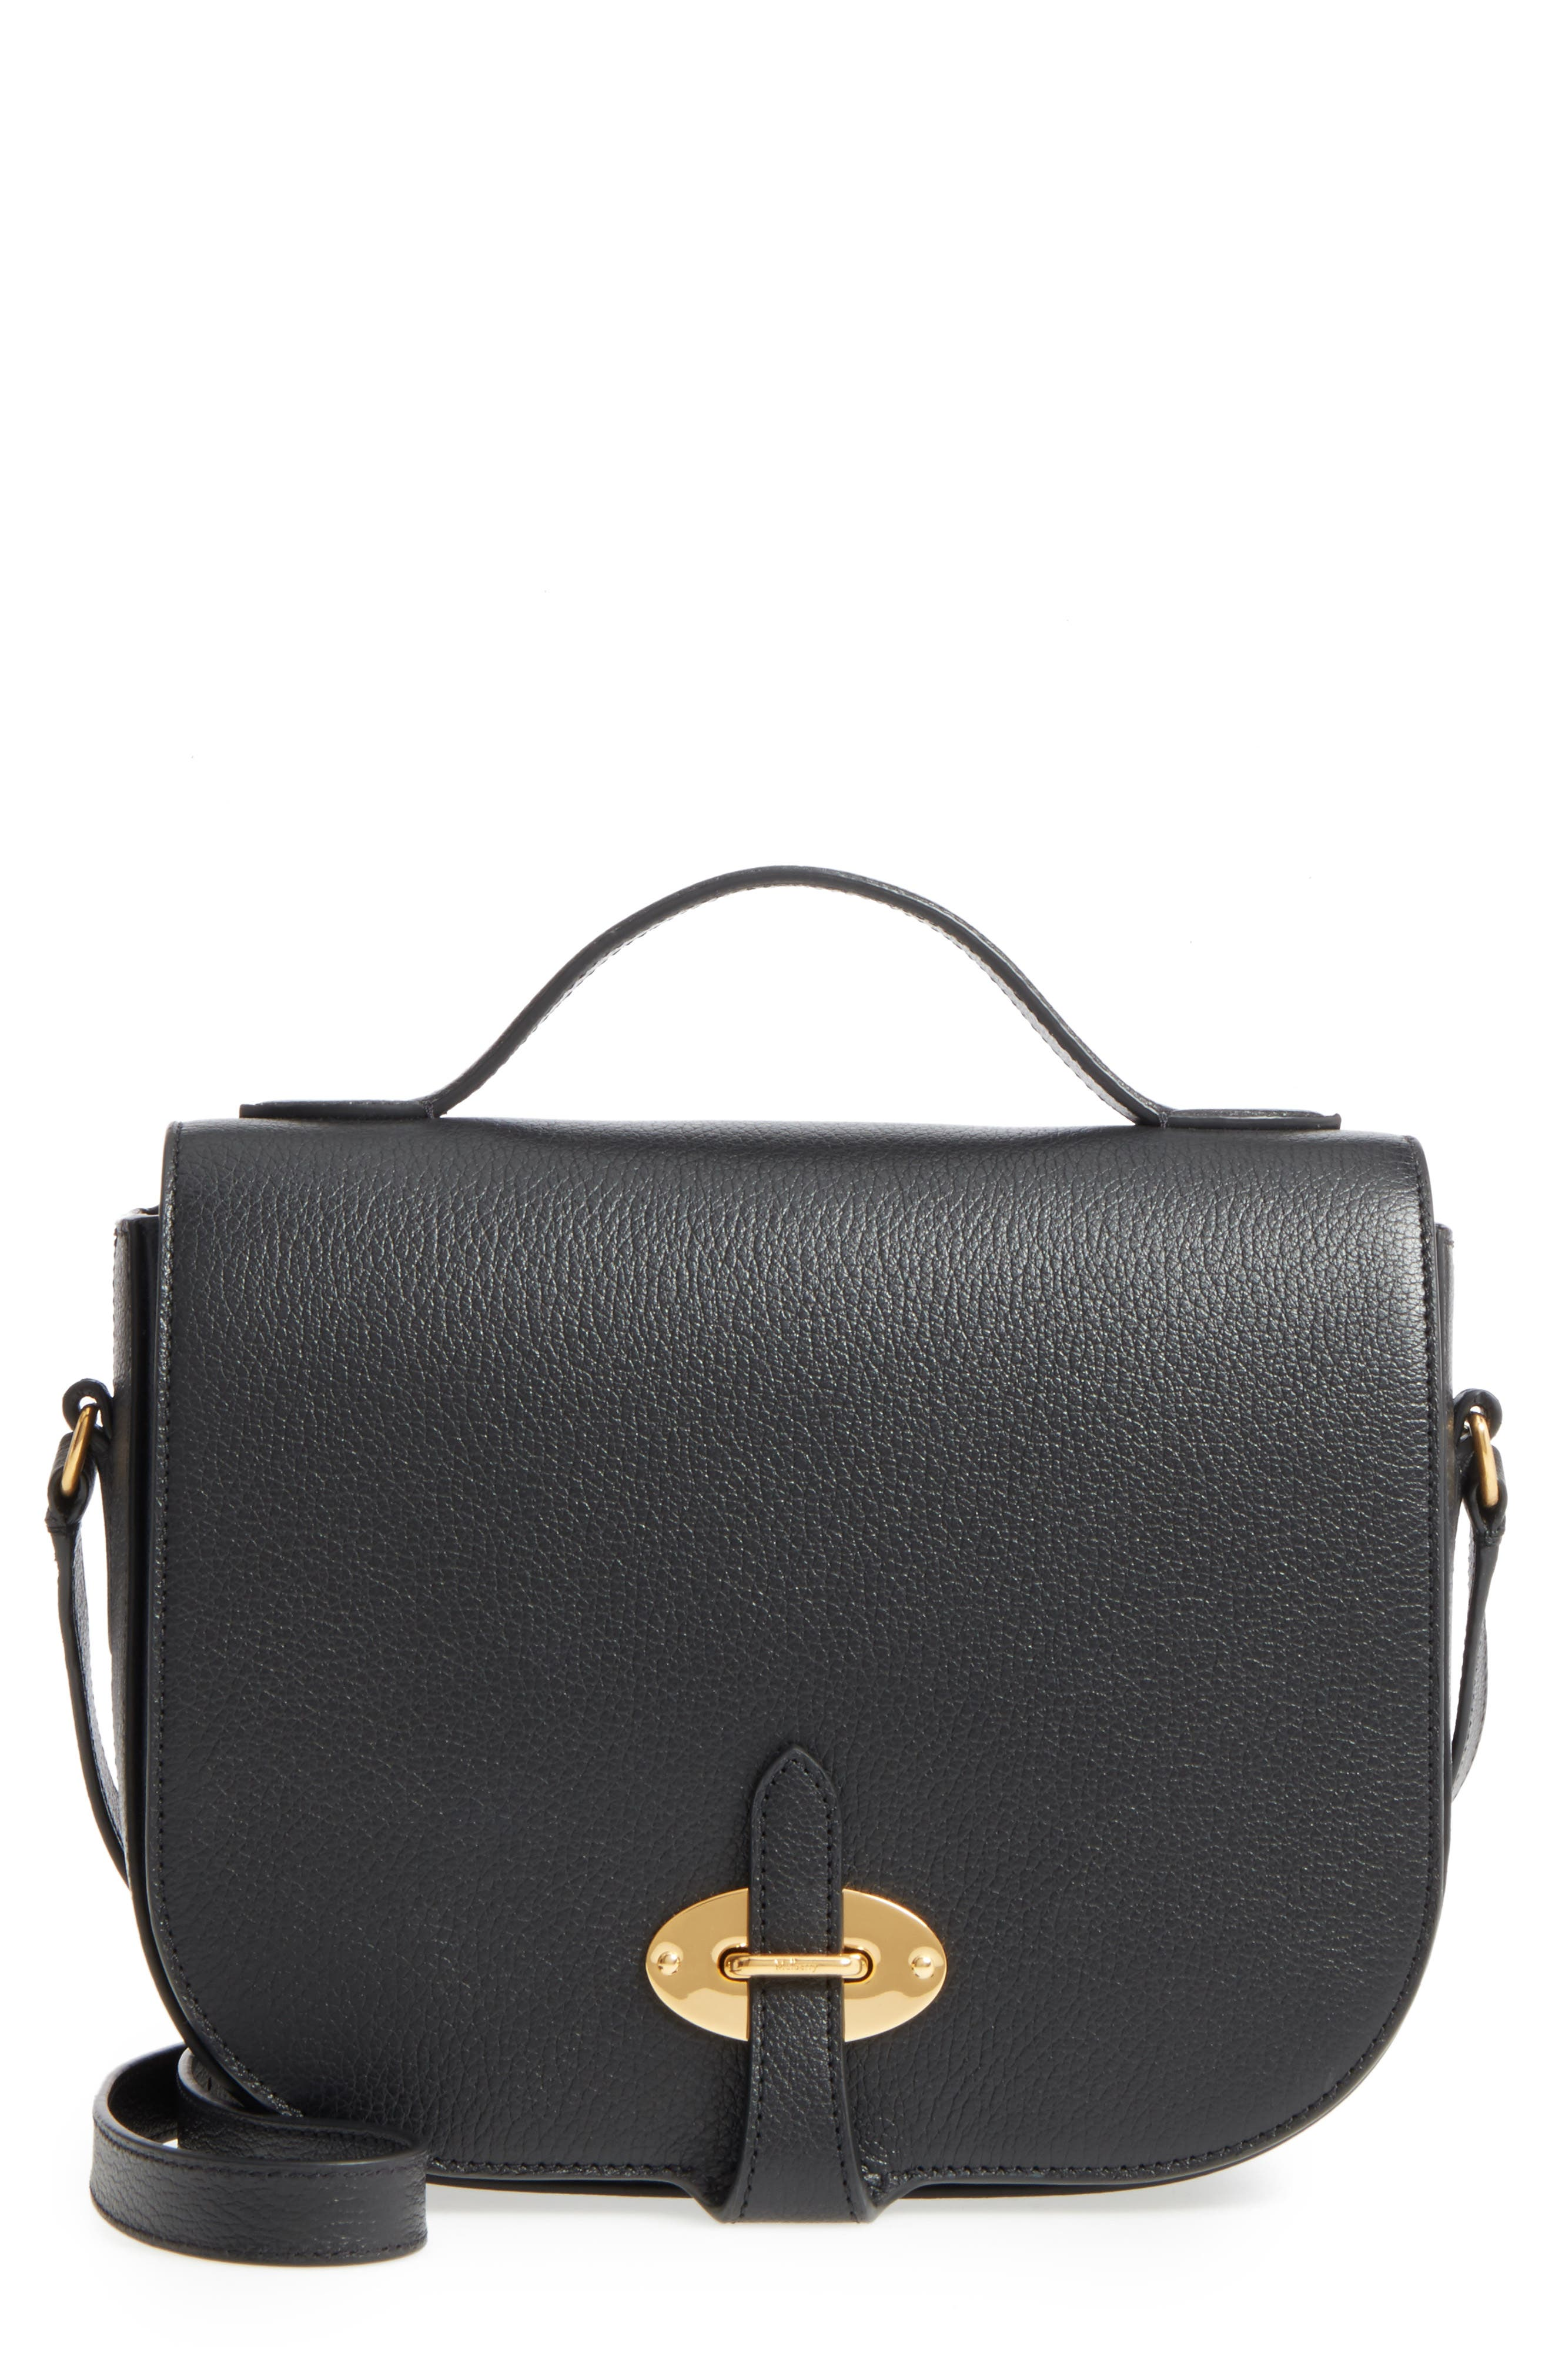 Tenby Calfskin Leather Crossbody Bag,                         Main,                         color, 001